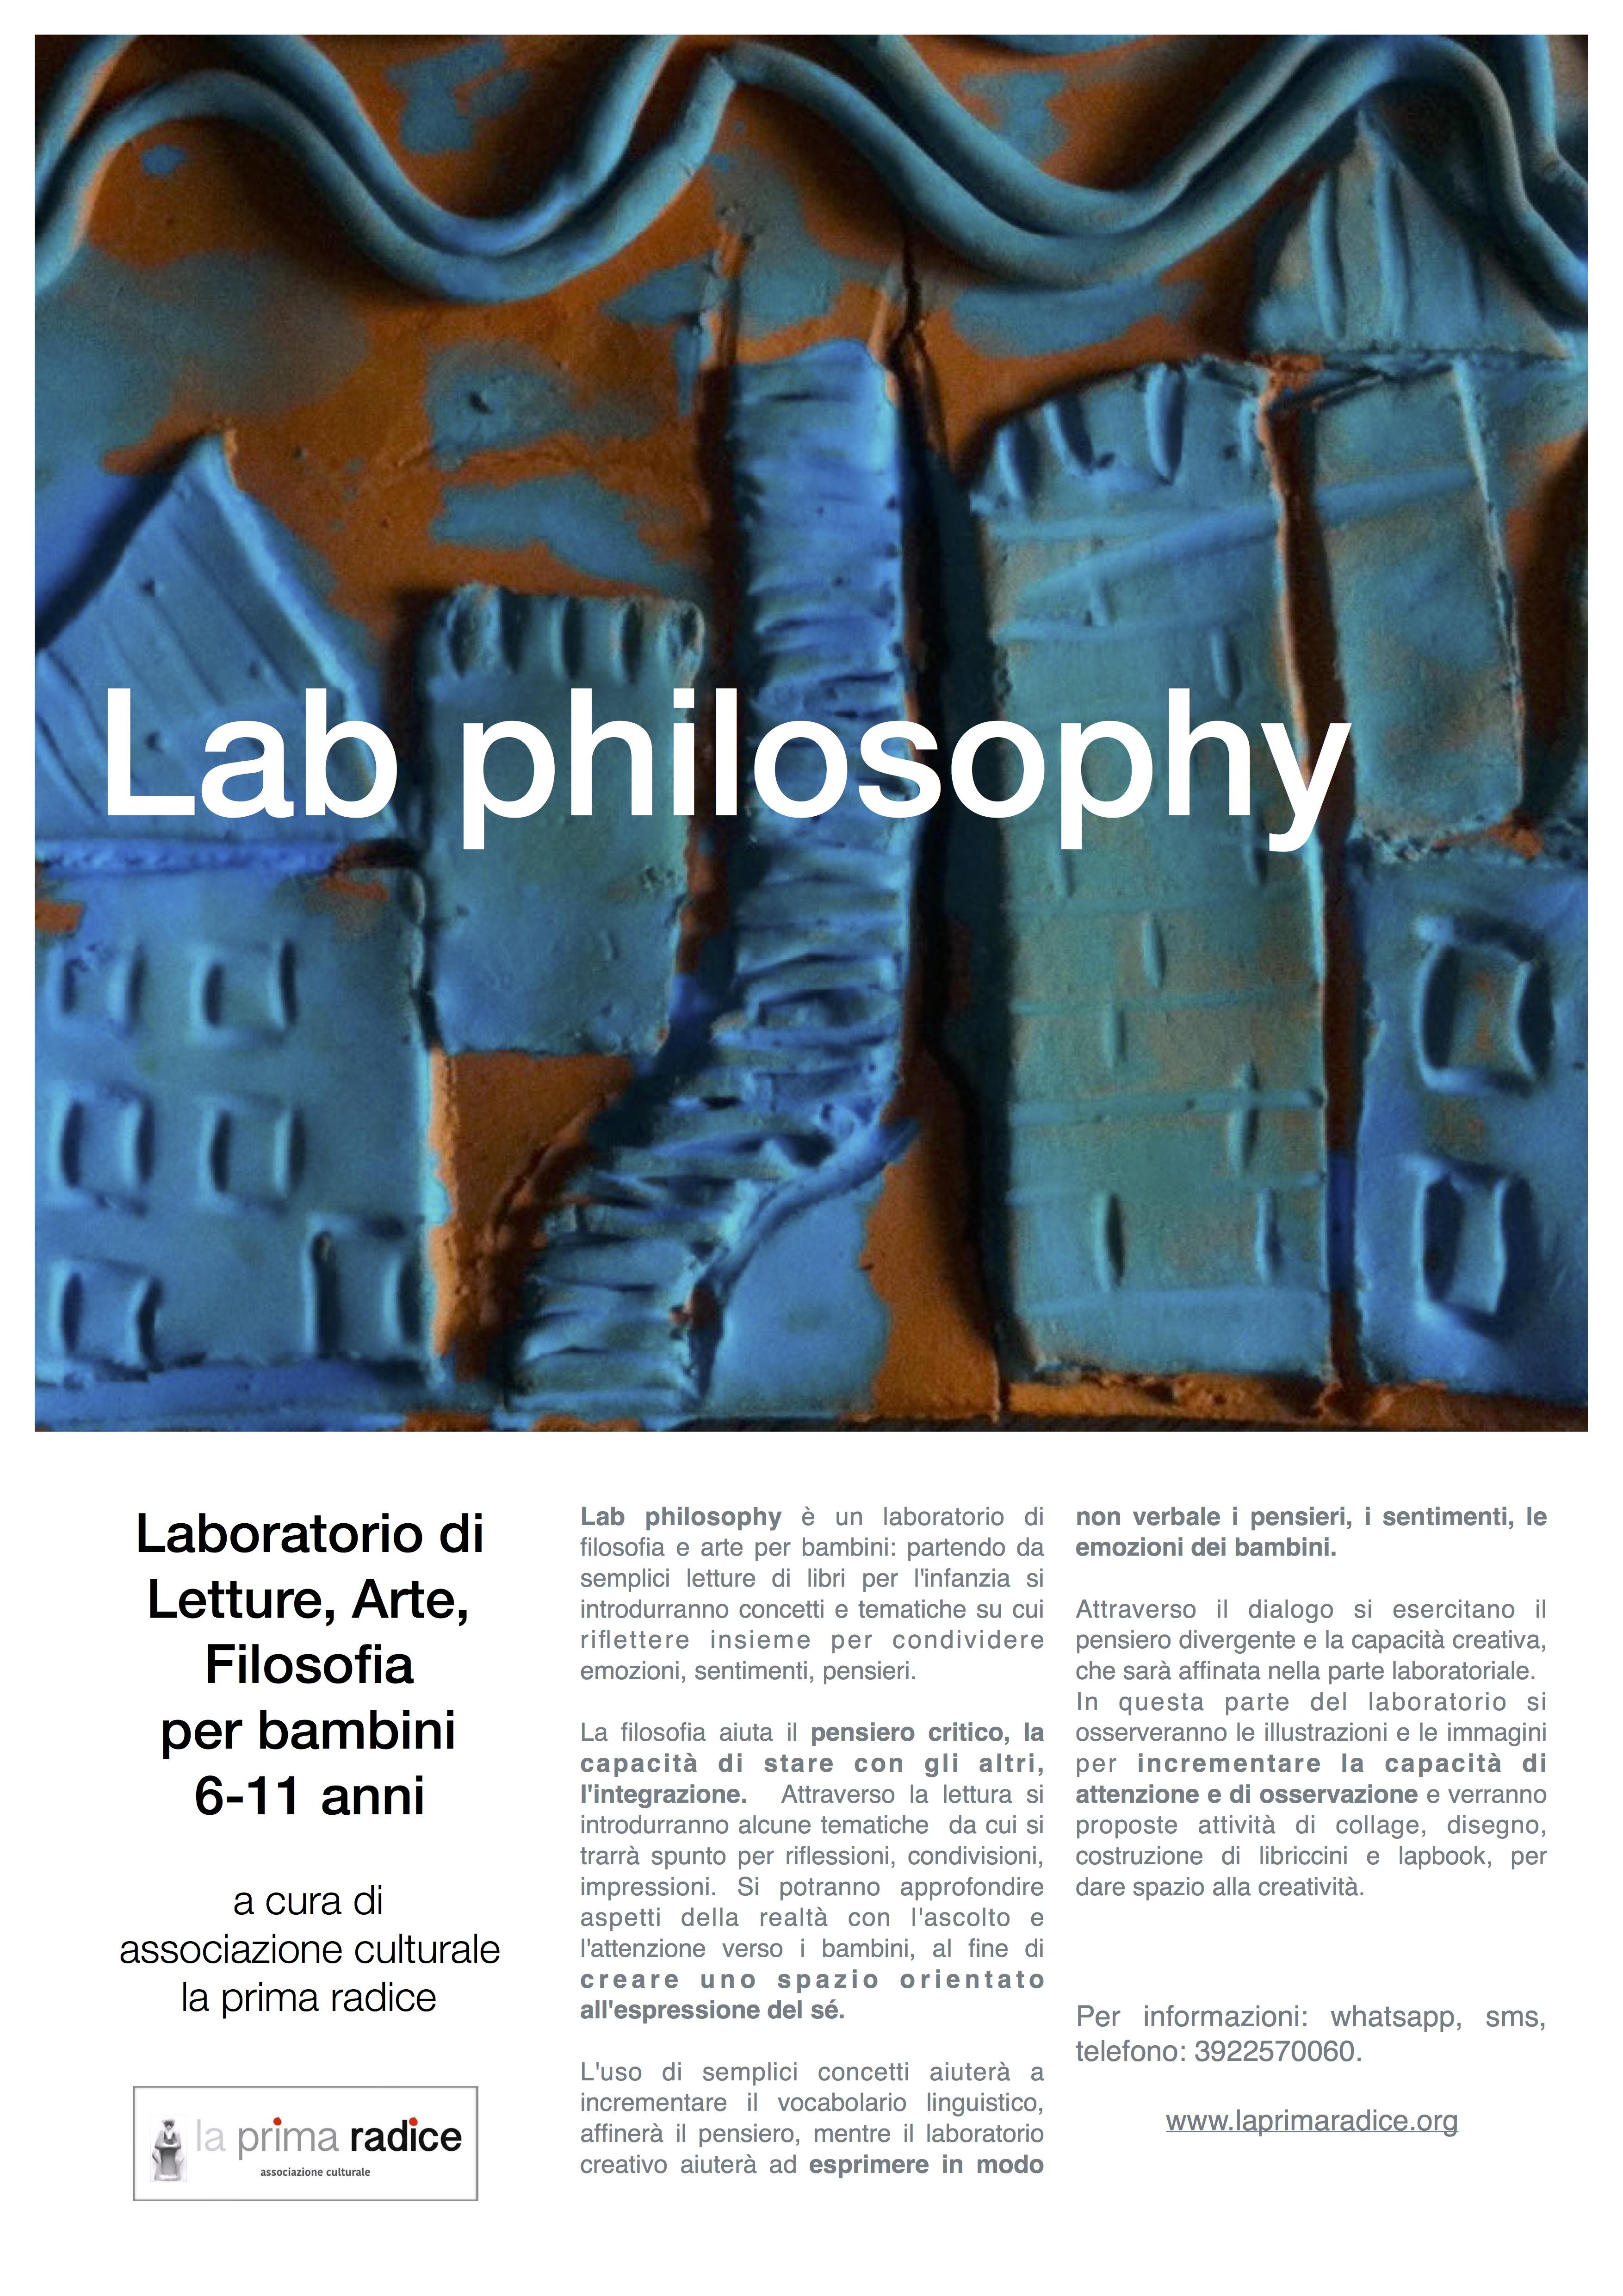 labphilosophy.jpg